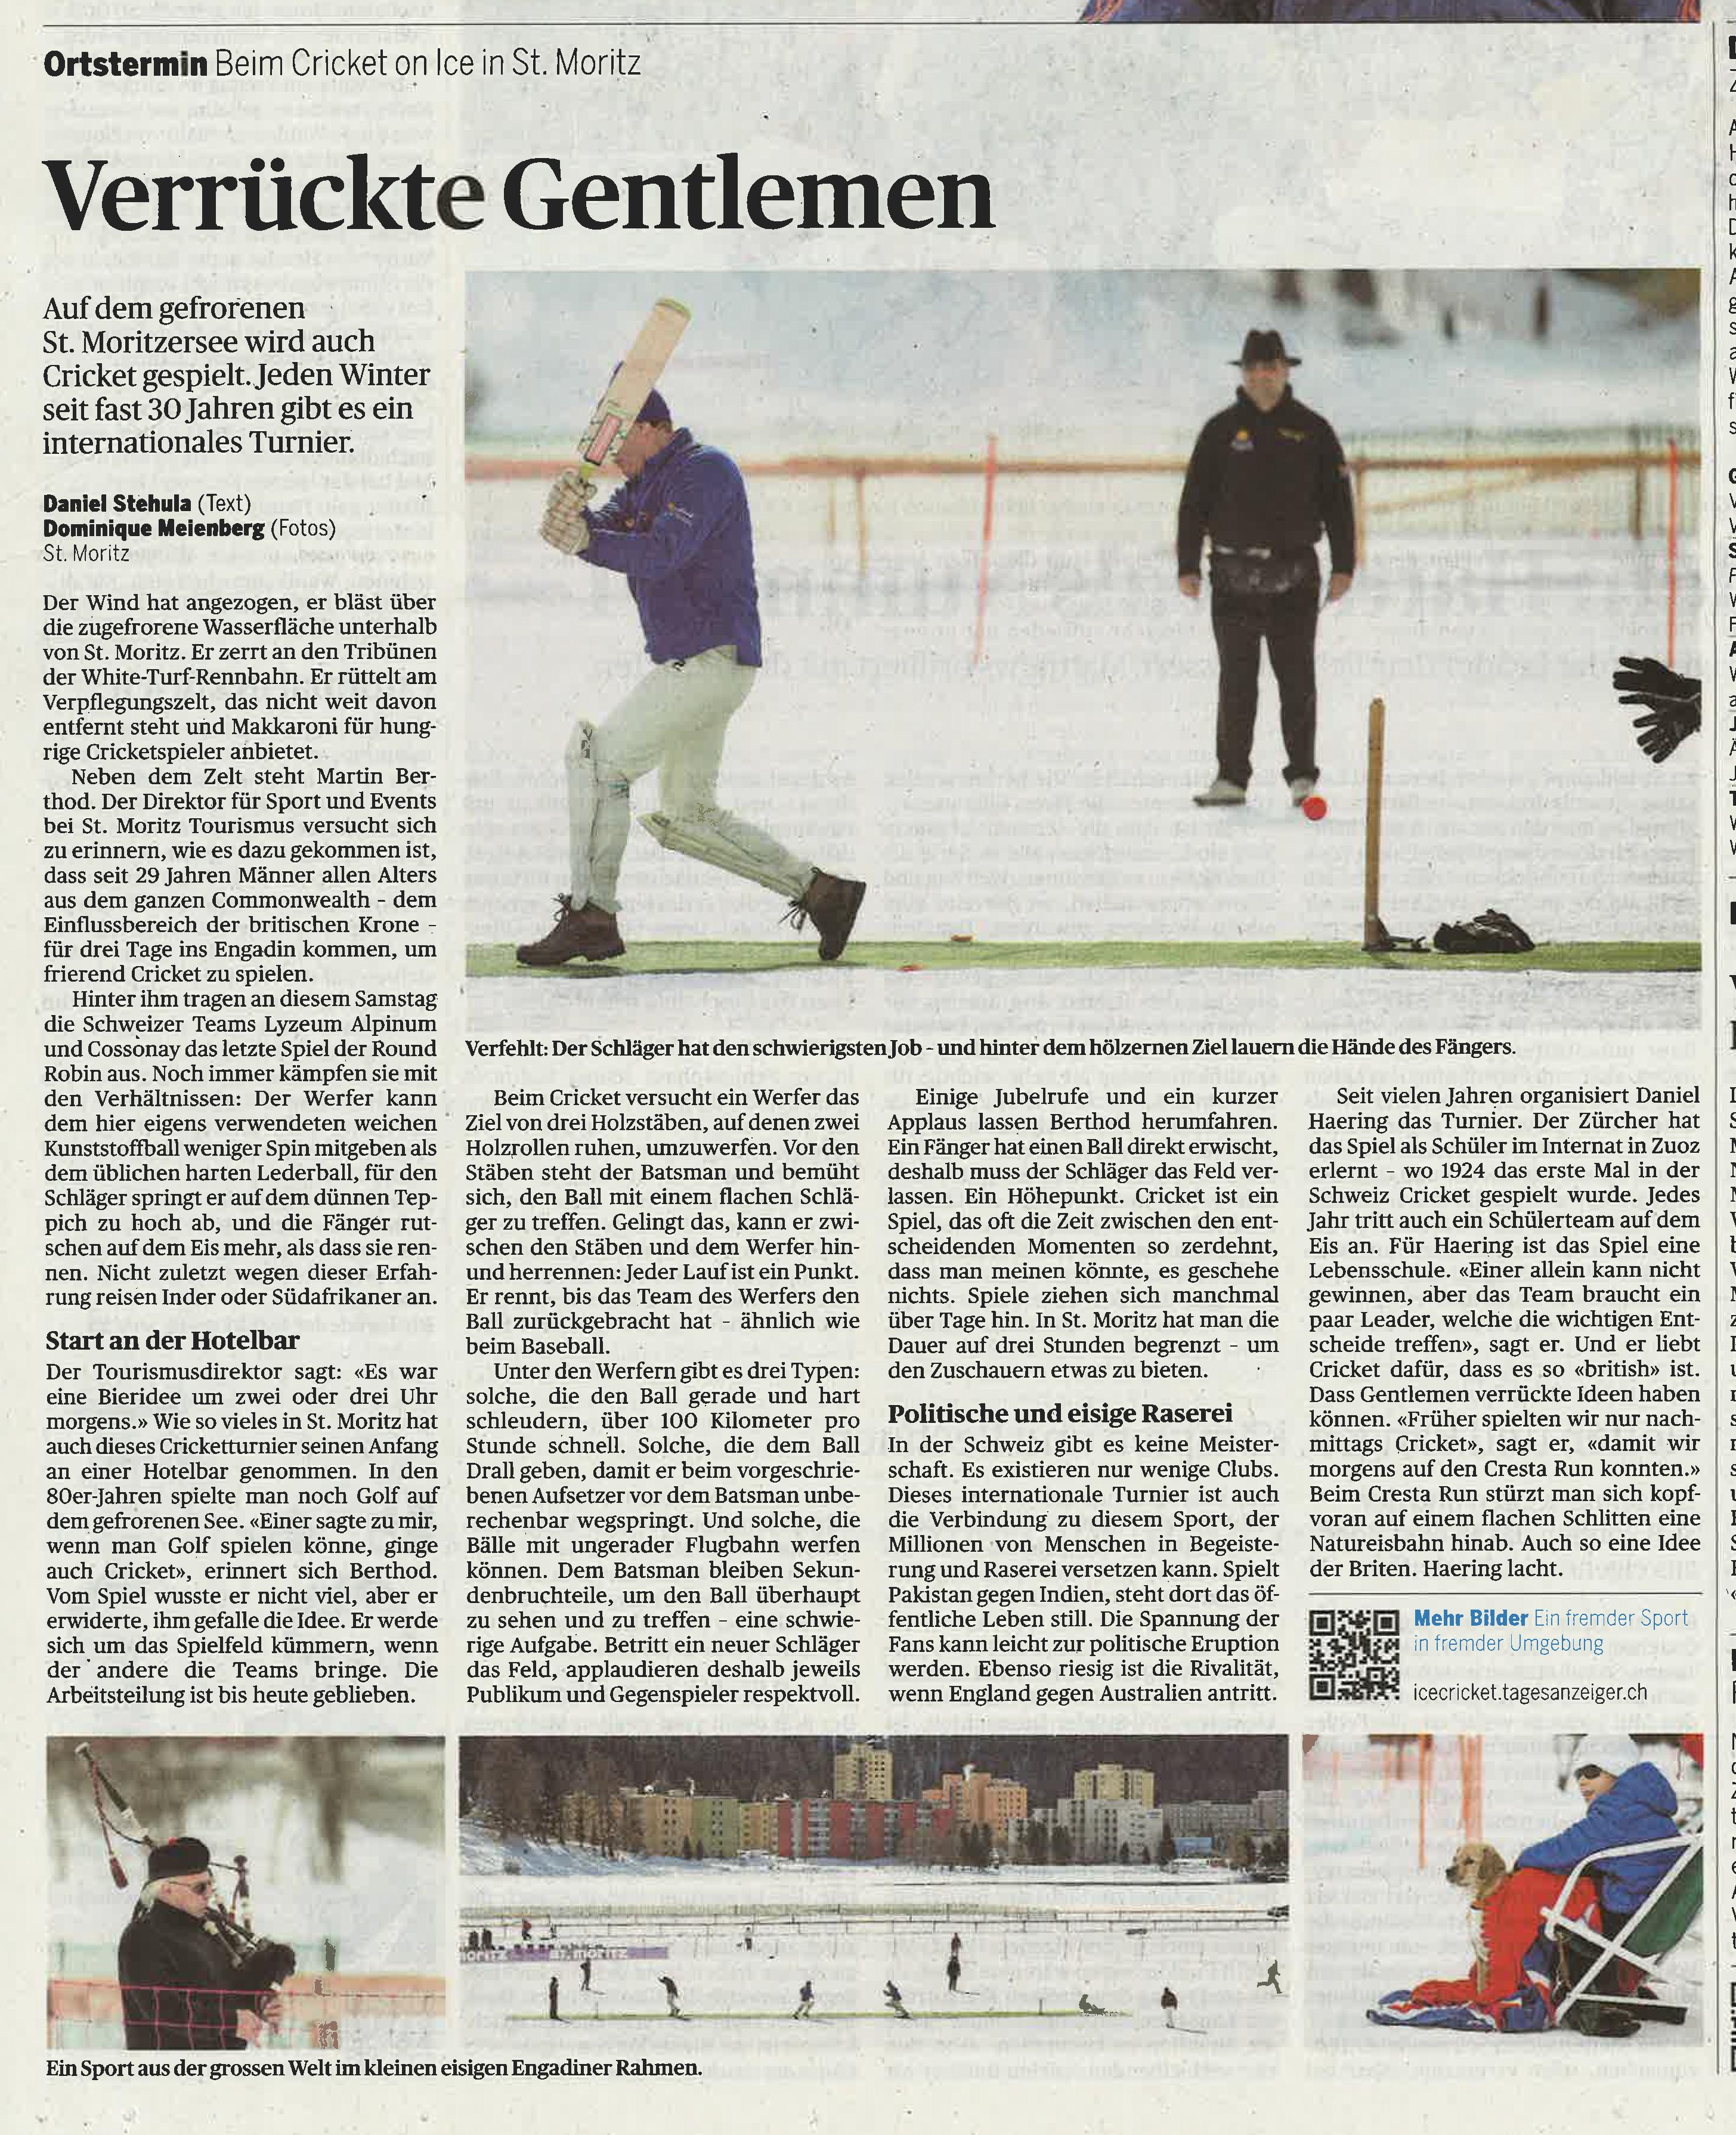 Media archives - Cricket on Ice / St. Moritz Switzerland